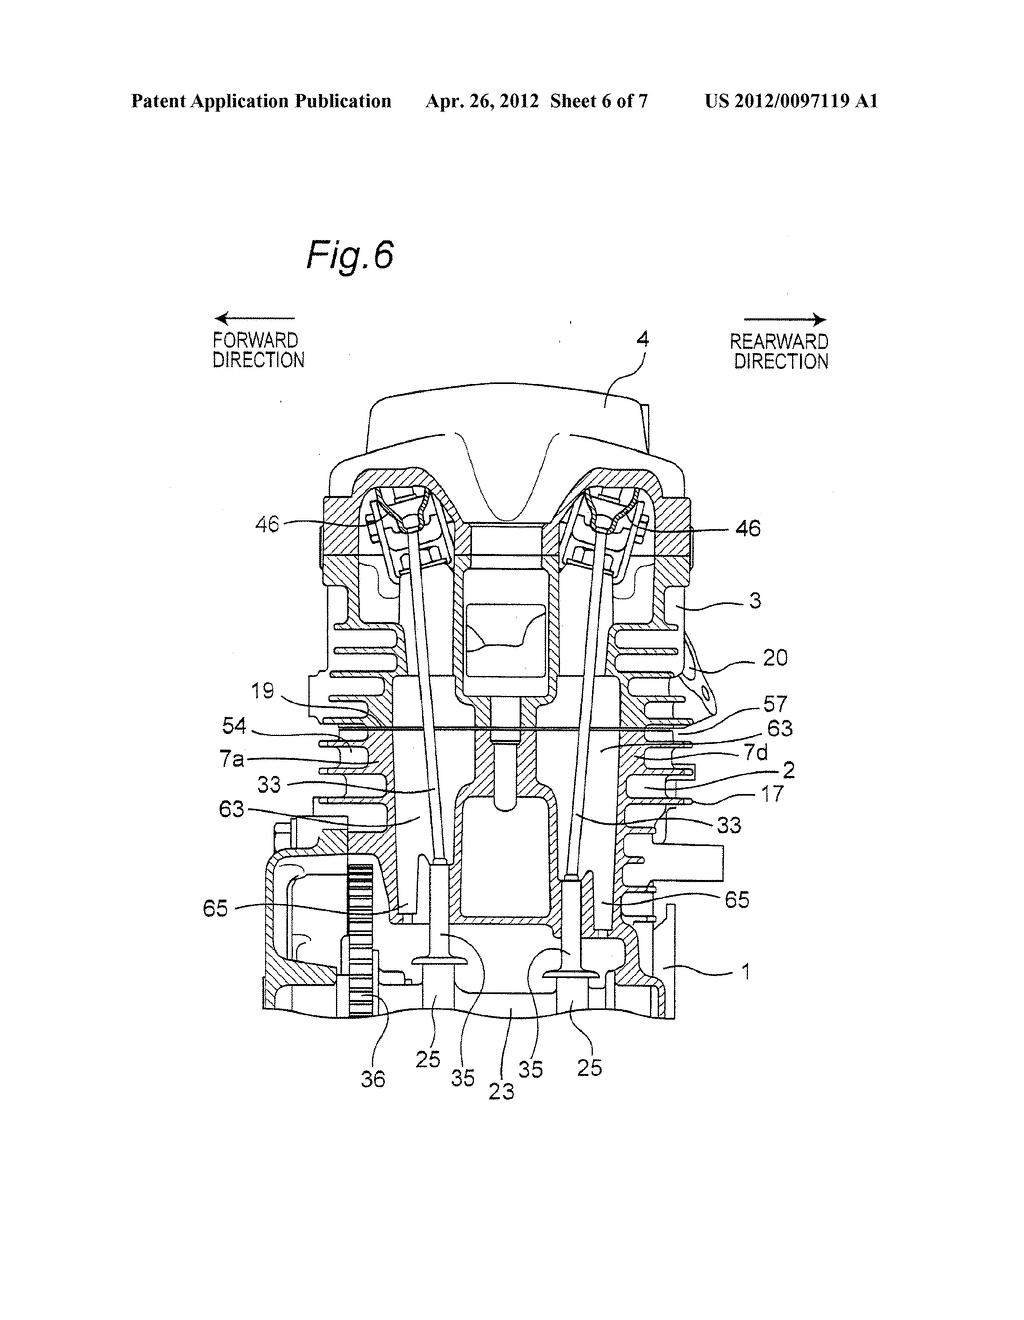 porsche 964 stereo wiring diagram 2000 acura integra radio 993 engine imageresizertool com